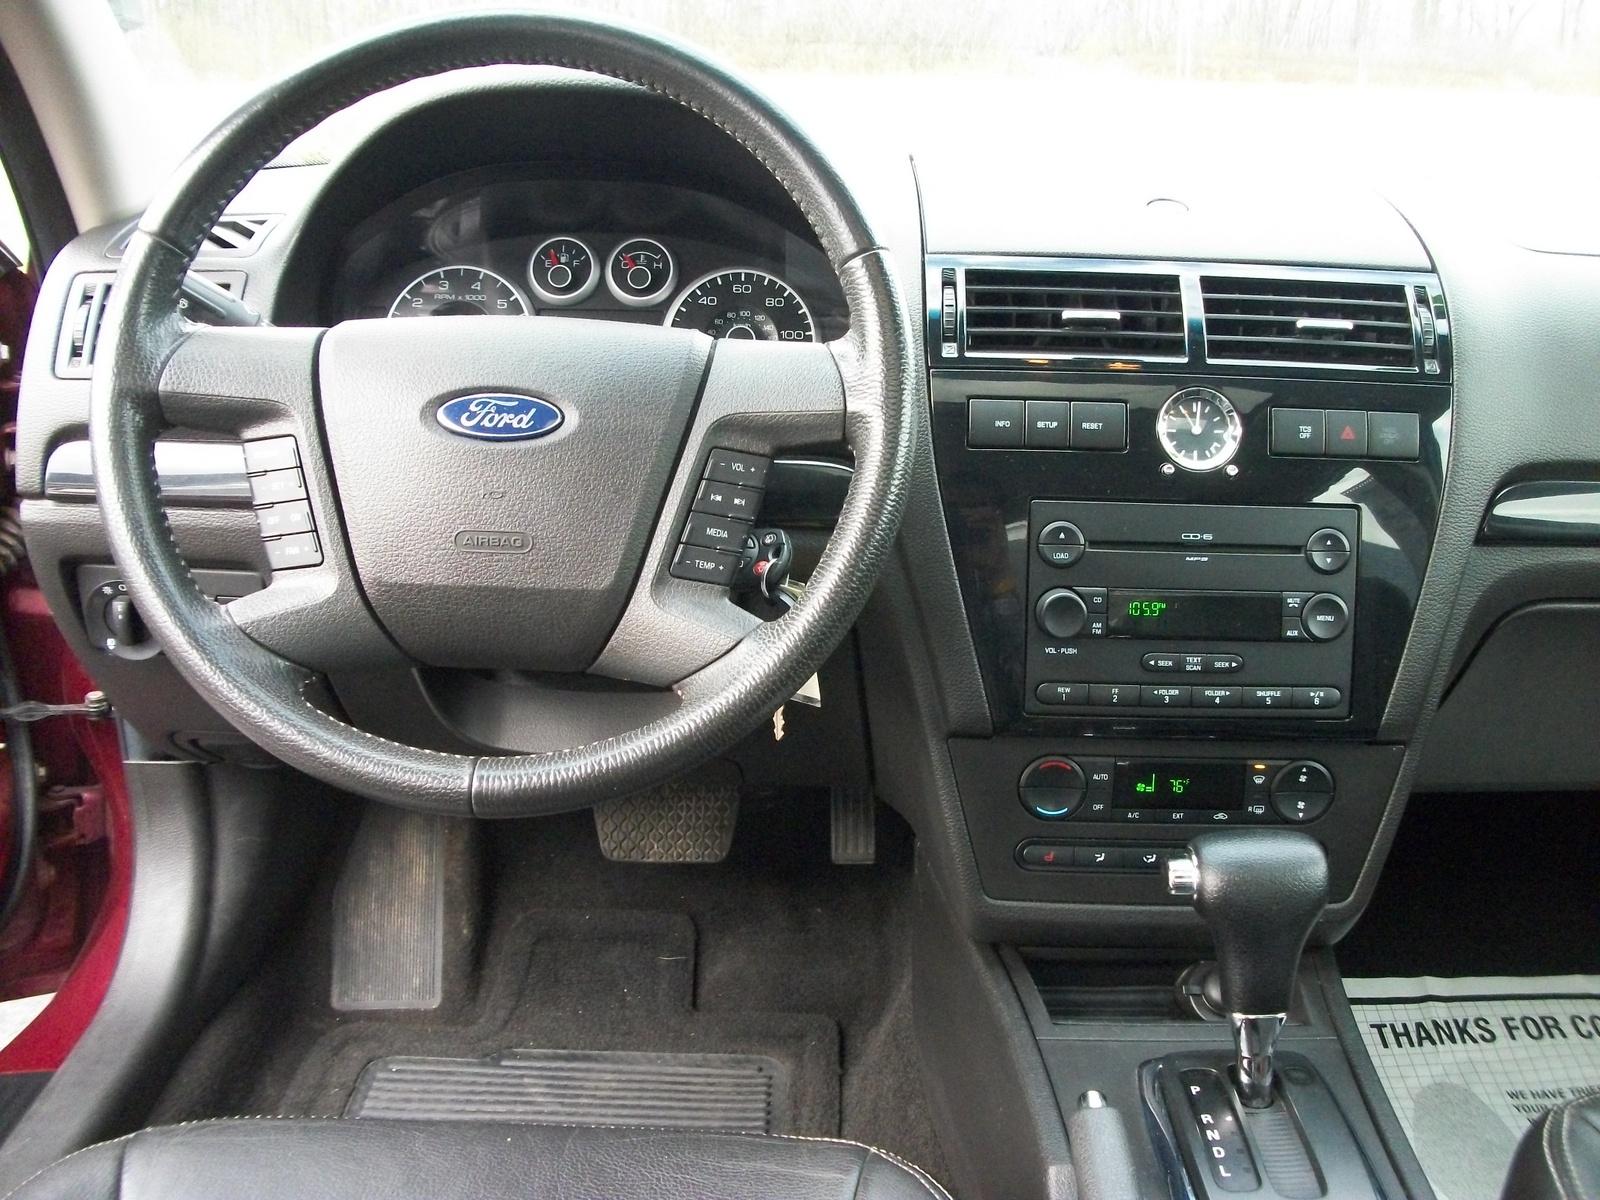 2007 Ford Fusion Rims >> 2007 Ford Fusion Interior - Carburetor Gallery